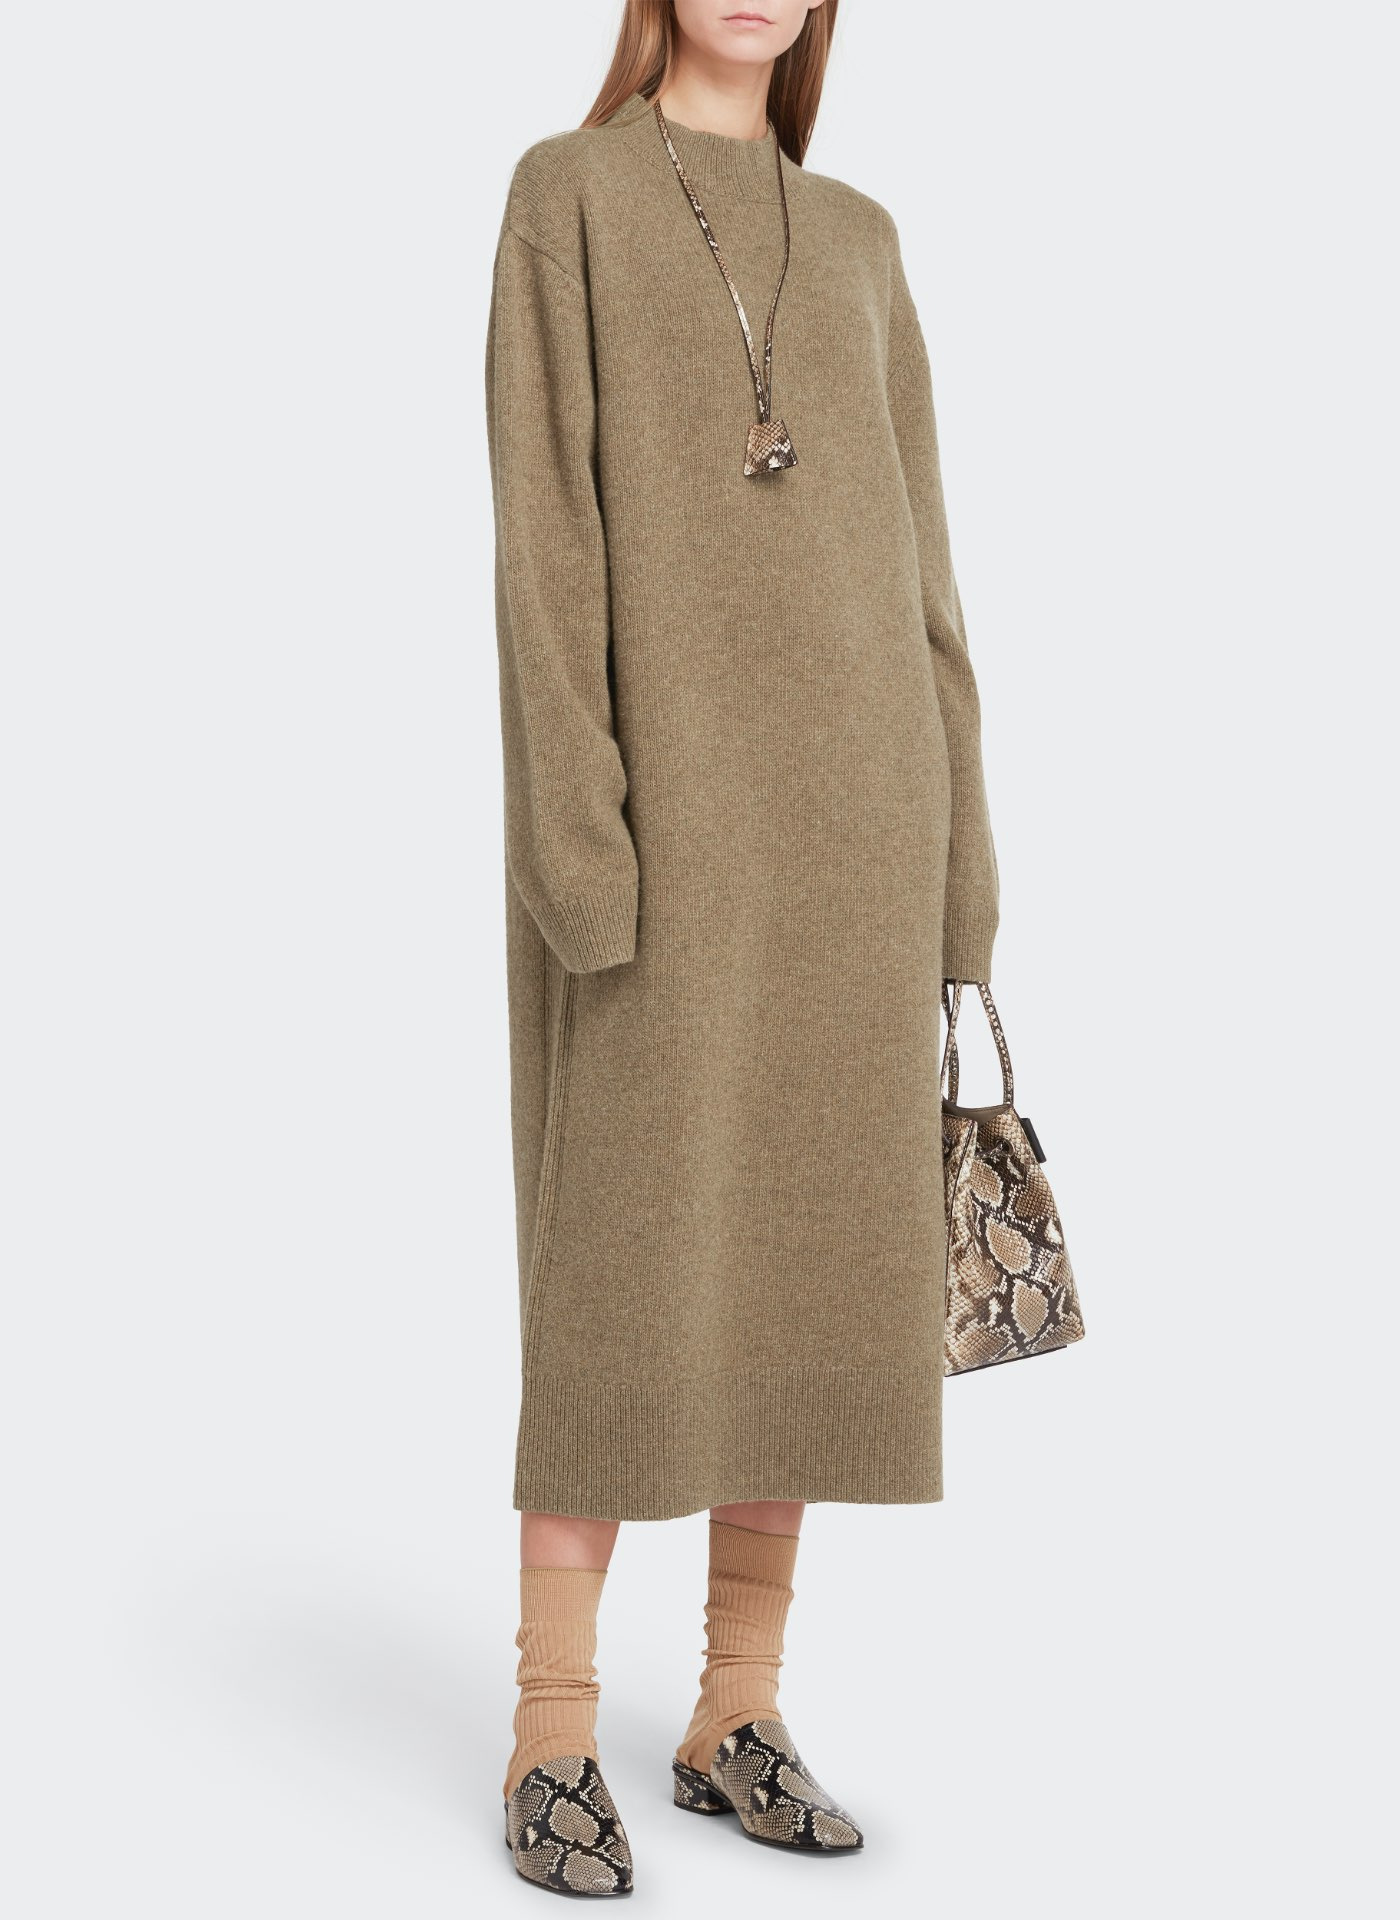 Womenswear model wearing pale moss long sweater dress with a camo pattern leather bag